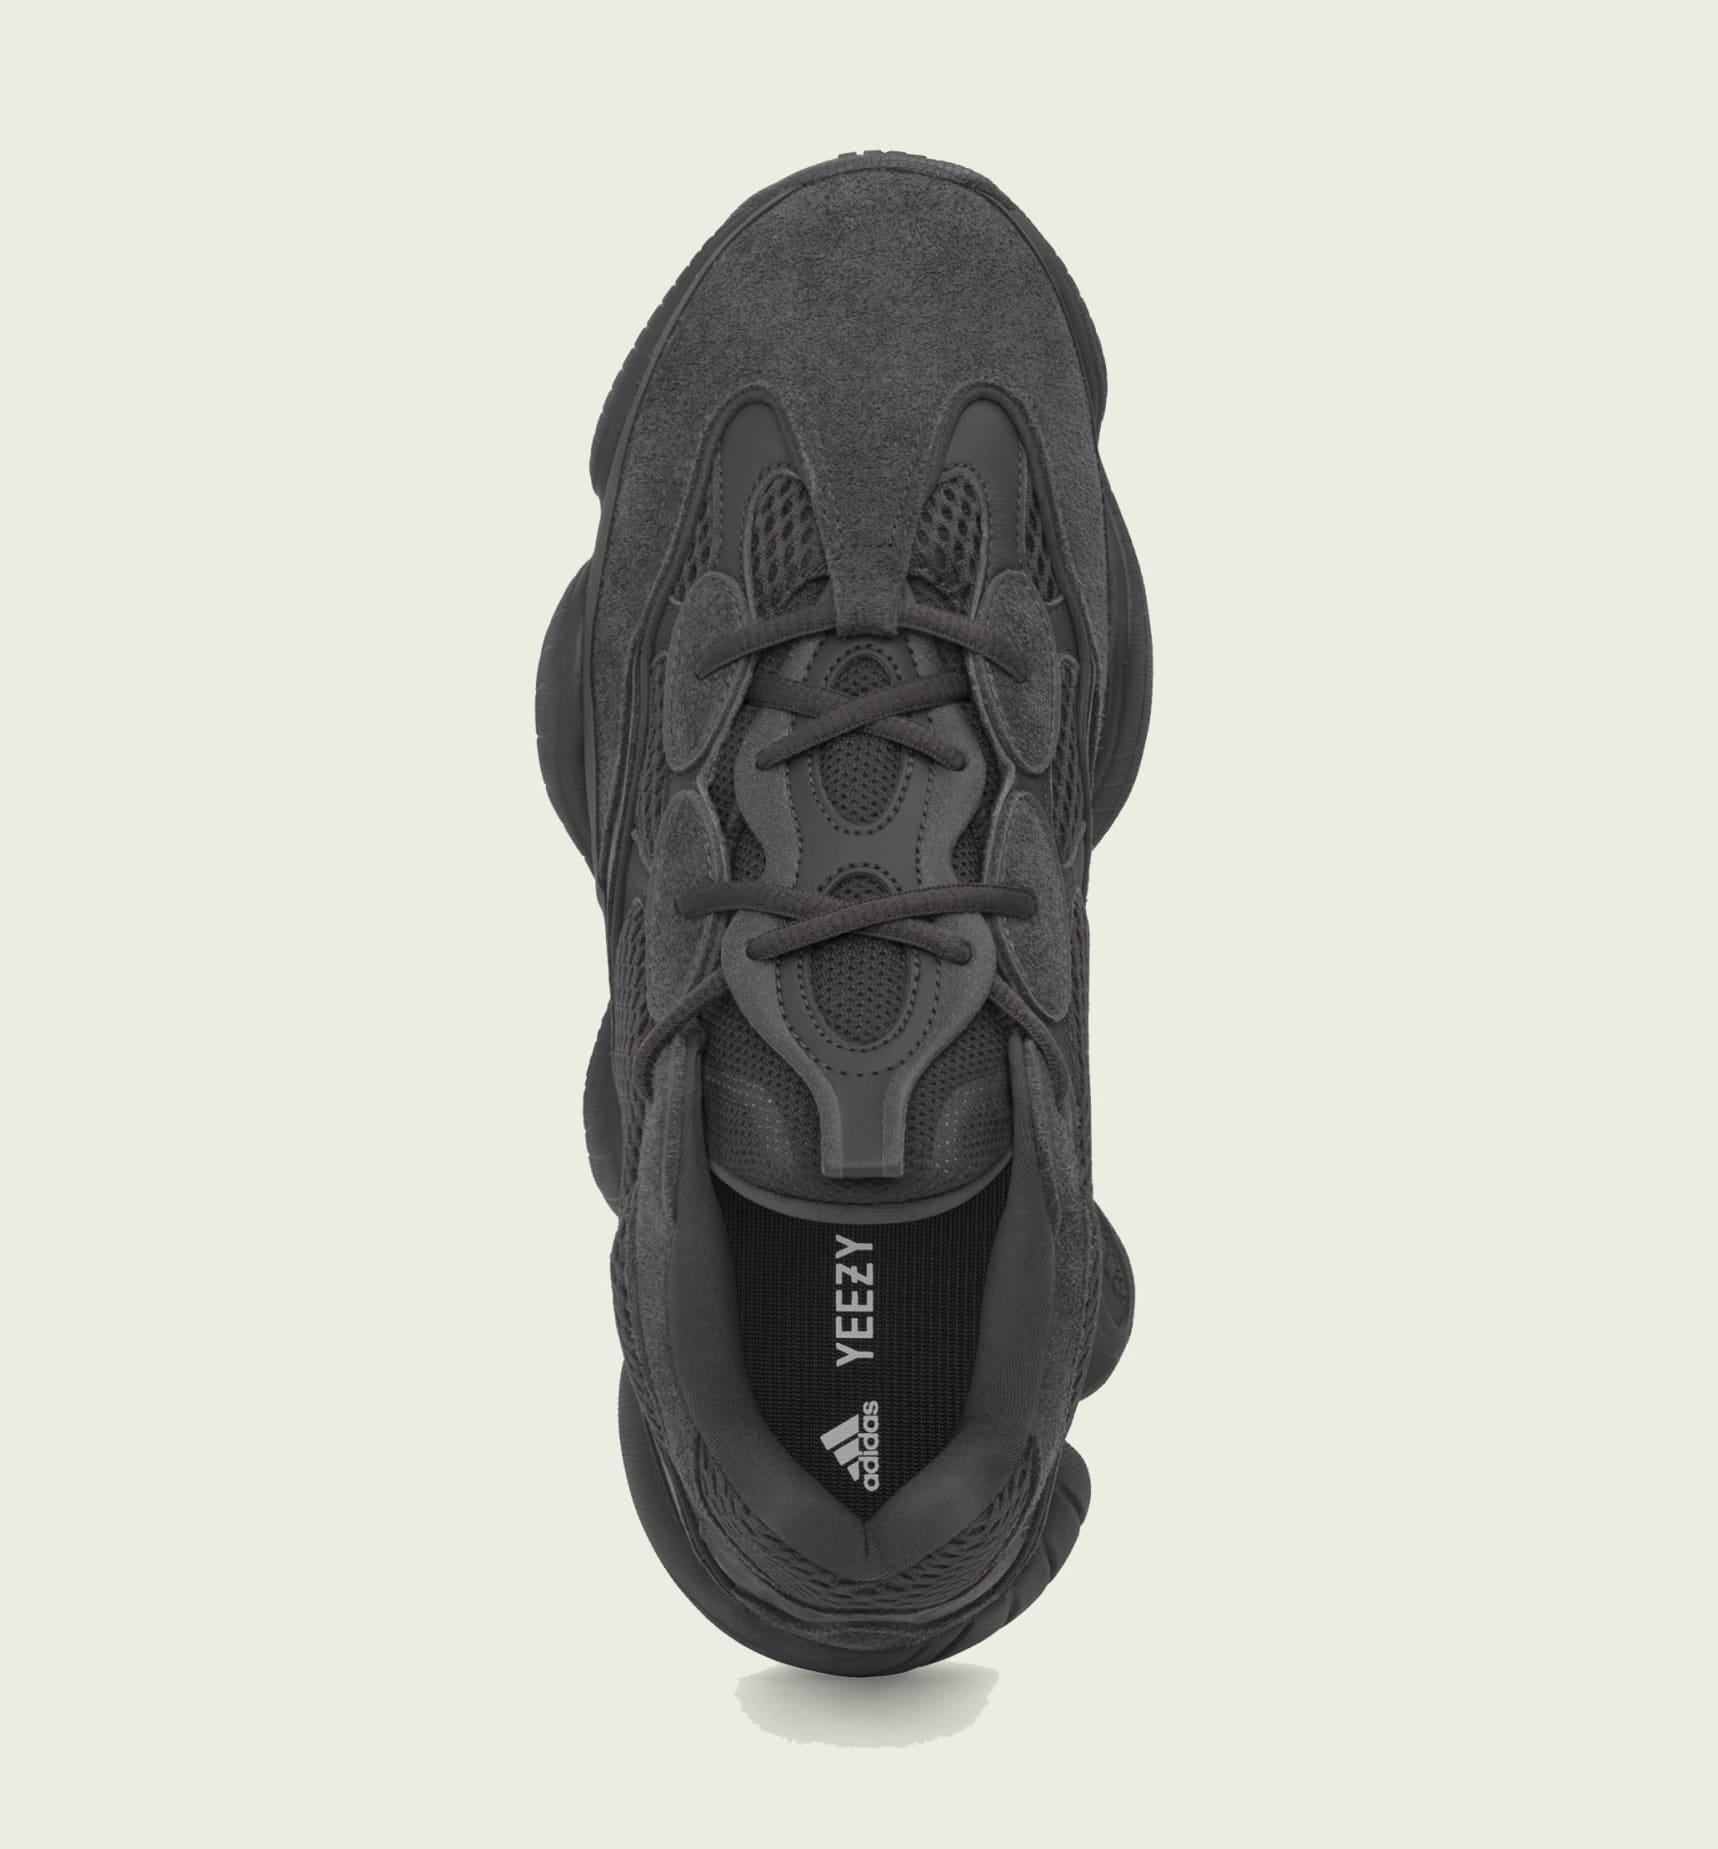 Adidas Yeezy 500 'Utility Black' F36640 Top